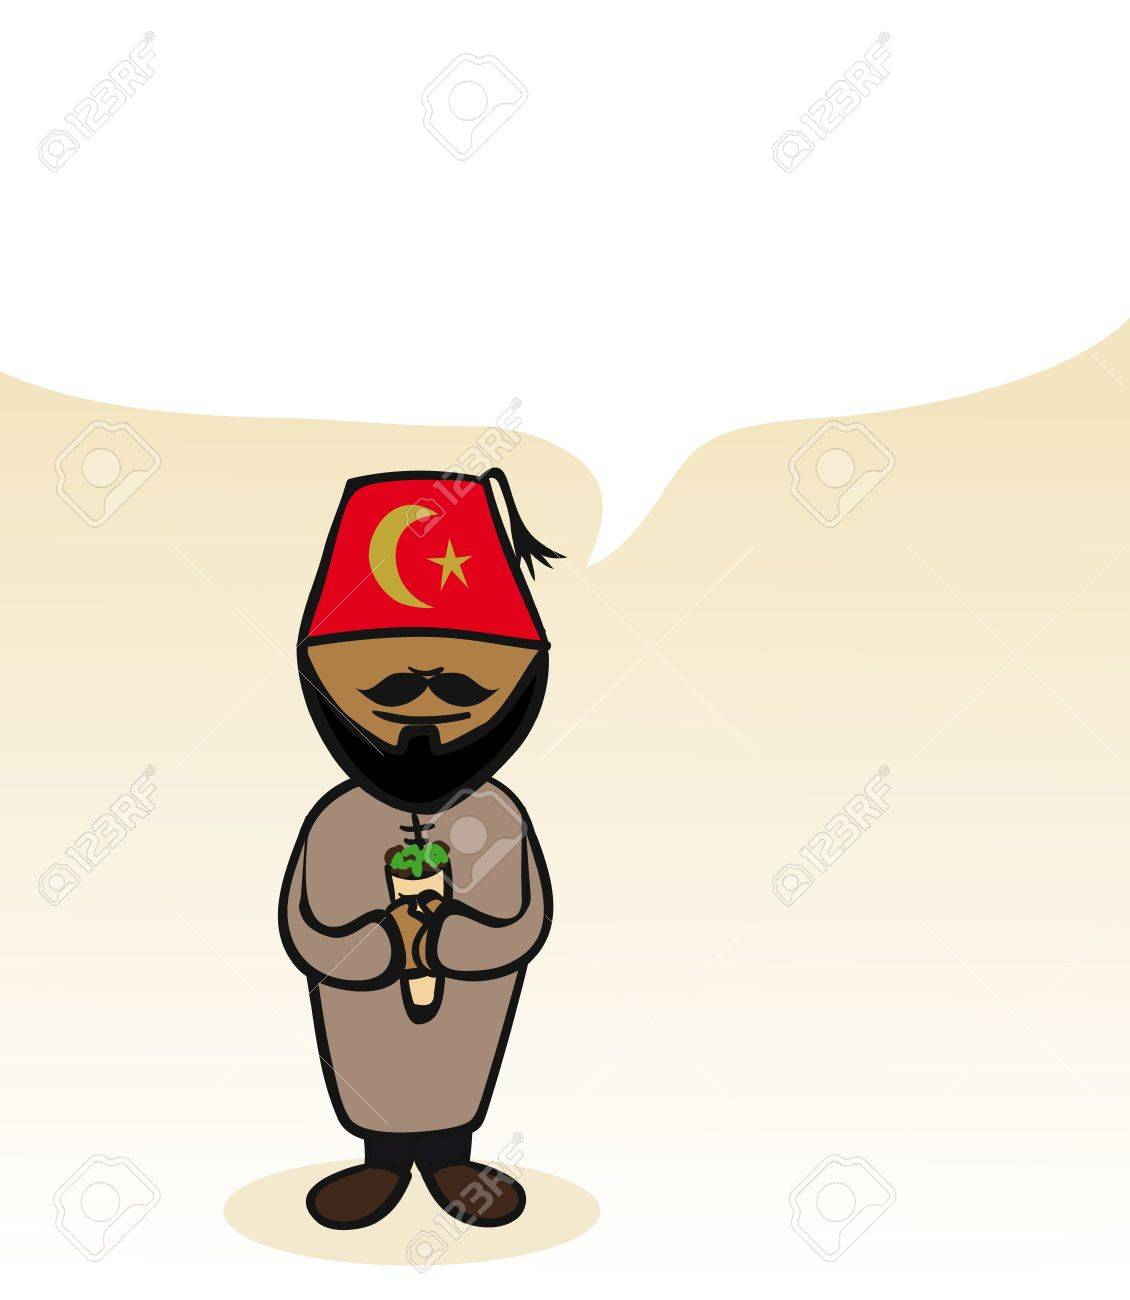 Turkish man cartoon couple with social media bubble. Stock Vector - 21280313